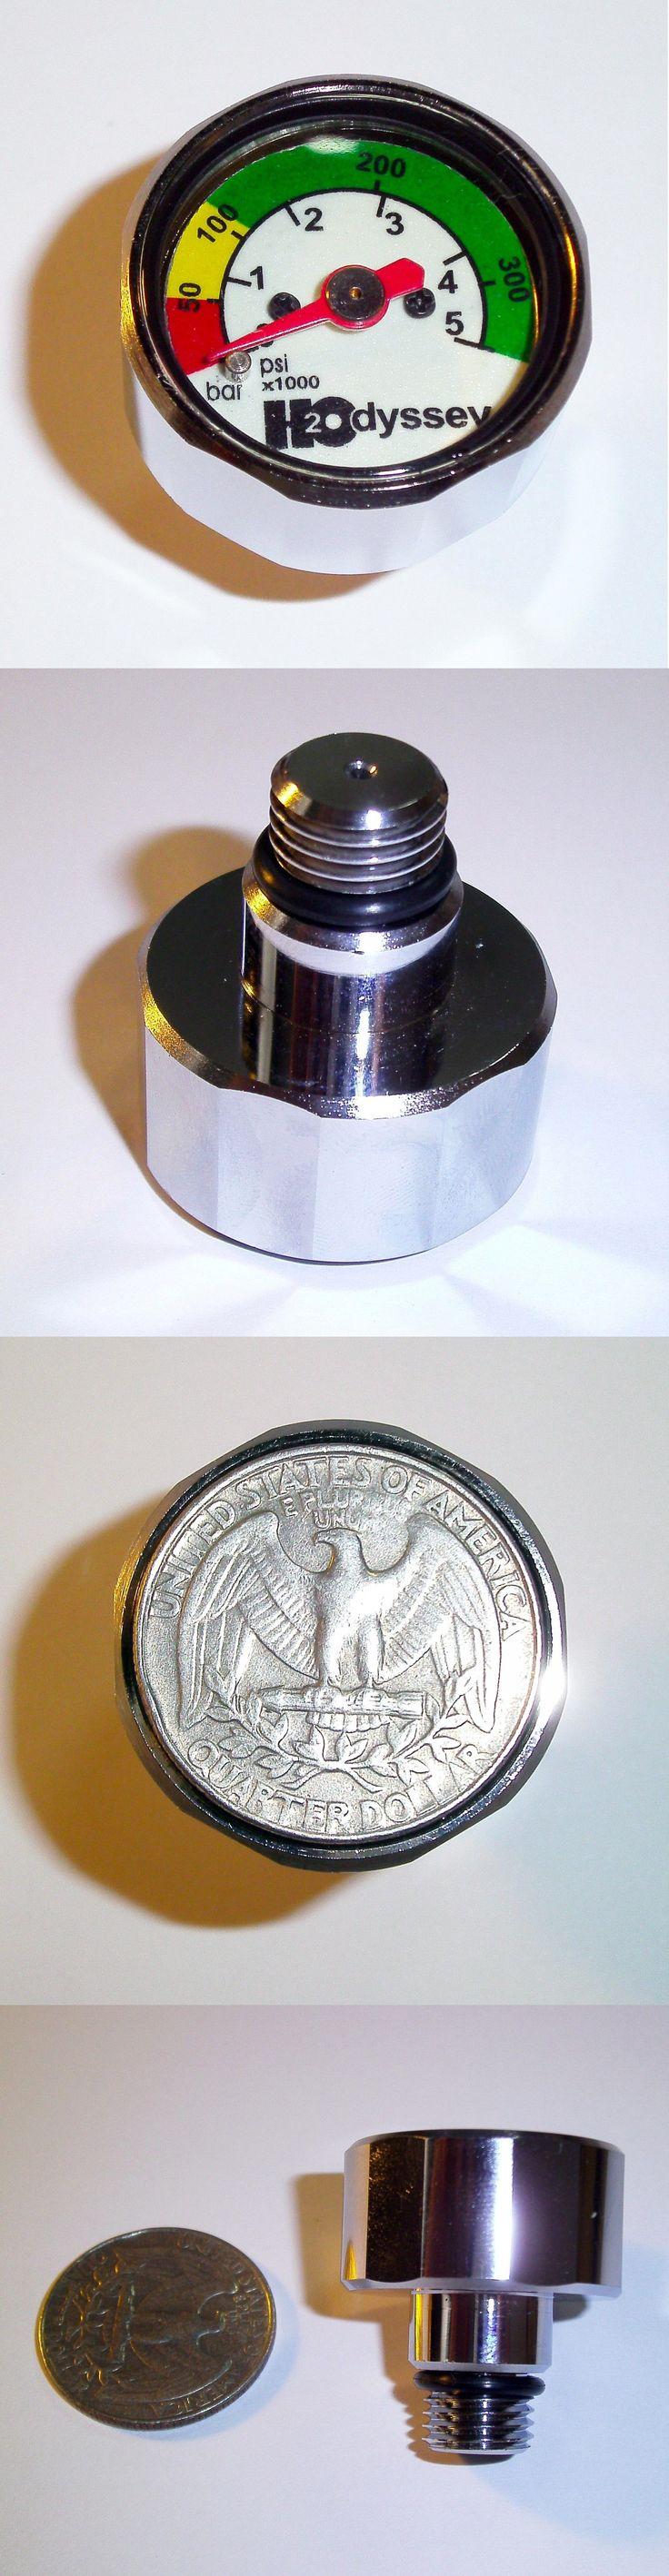 Gauges 74000 7 16 mini spg psi and bar high pressure regulator pony